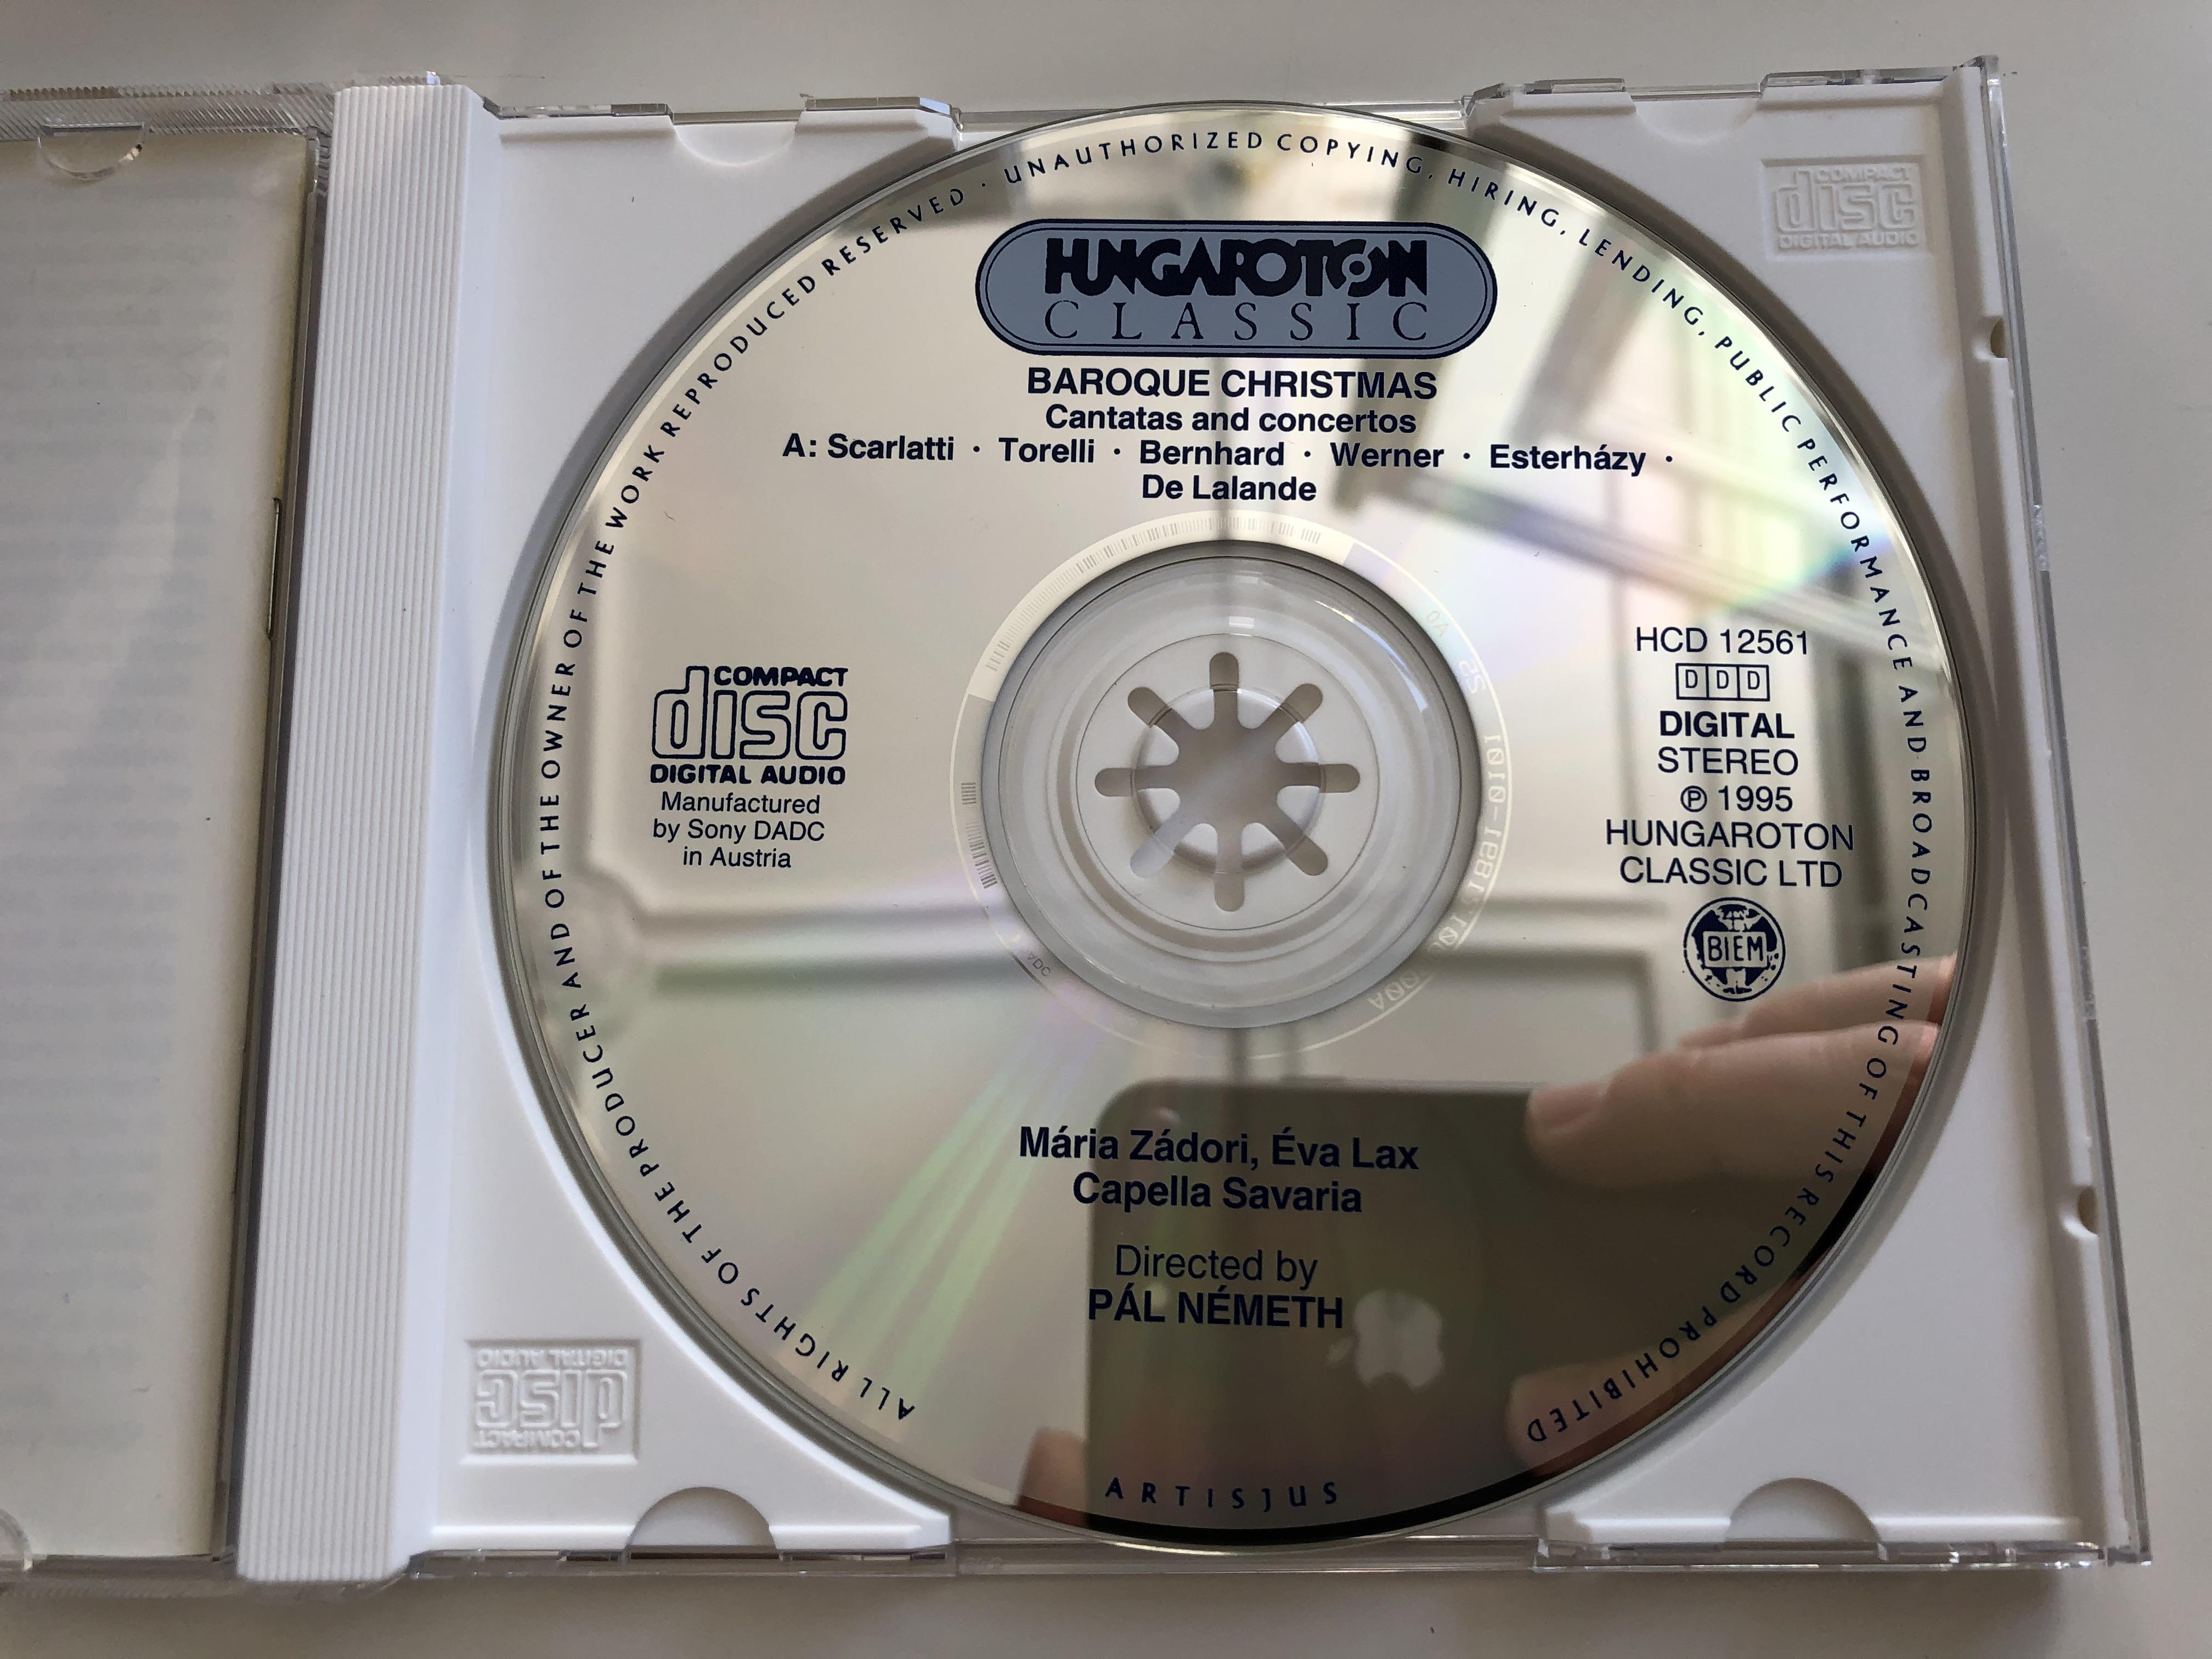 baroque-christmas-concertos-cantatas-a.-scarlatti-torelli-esterh-zy-de-lalande-m-ria-z-dori-capella-savaria-p-l-n-meth-hungaroton-classic-audio-cd-1995-stereo-hcd-12561-6-.jpg